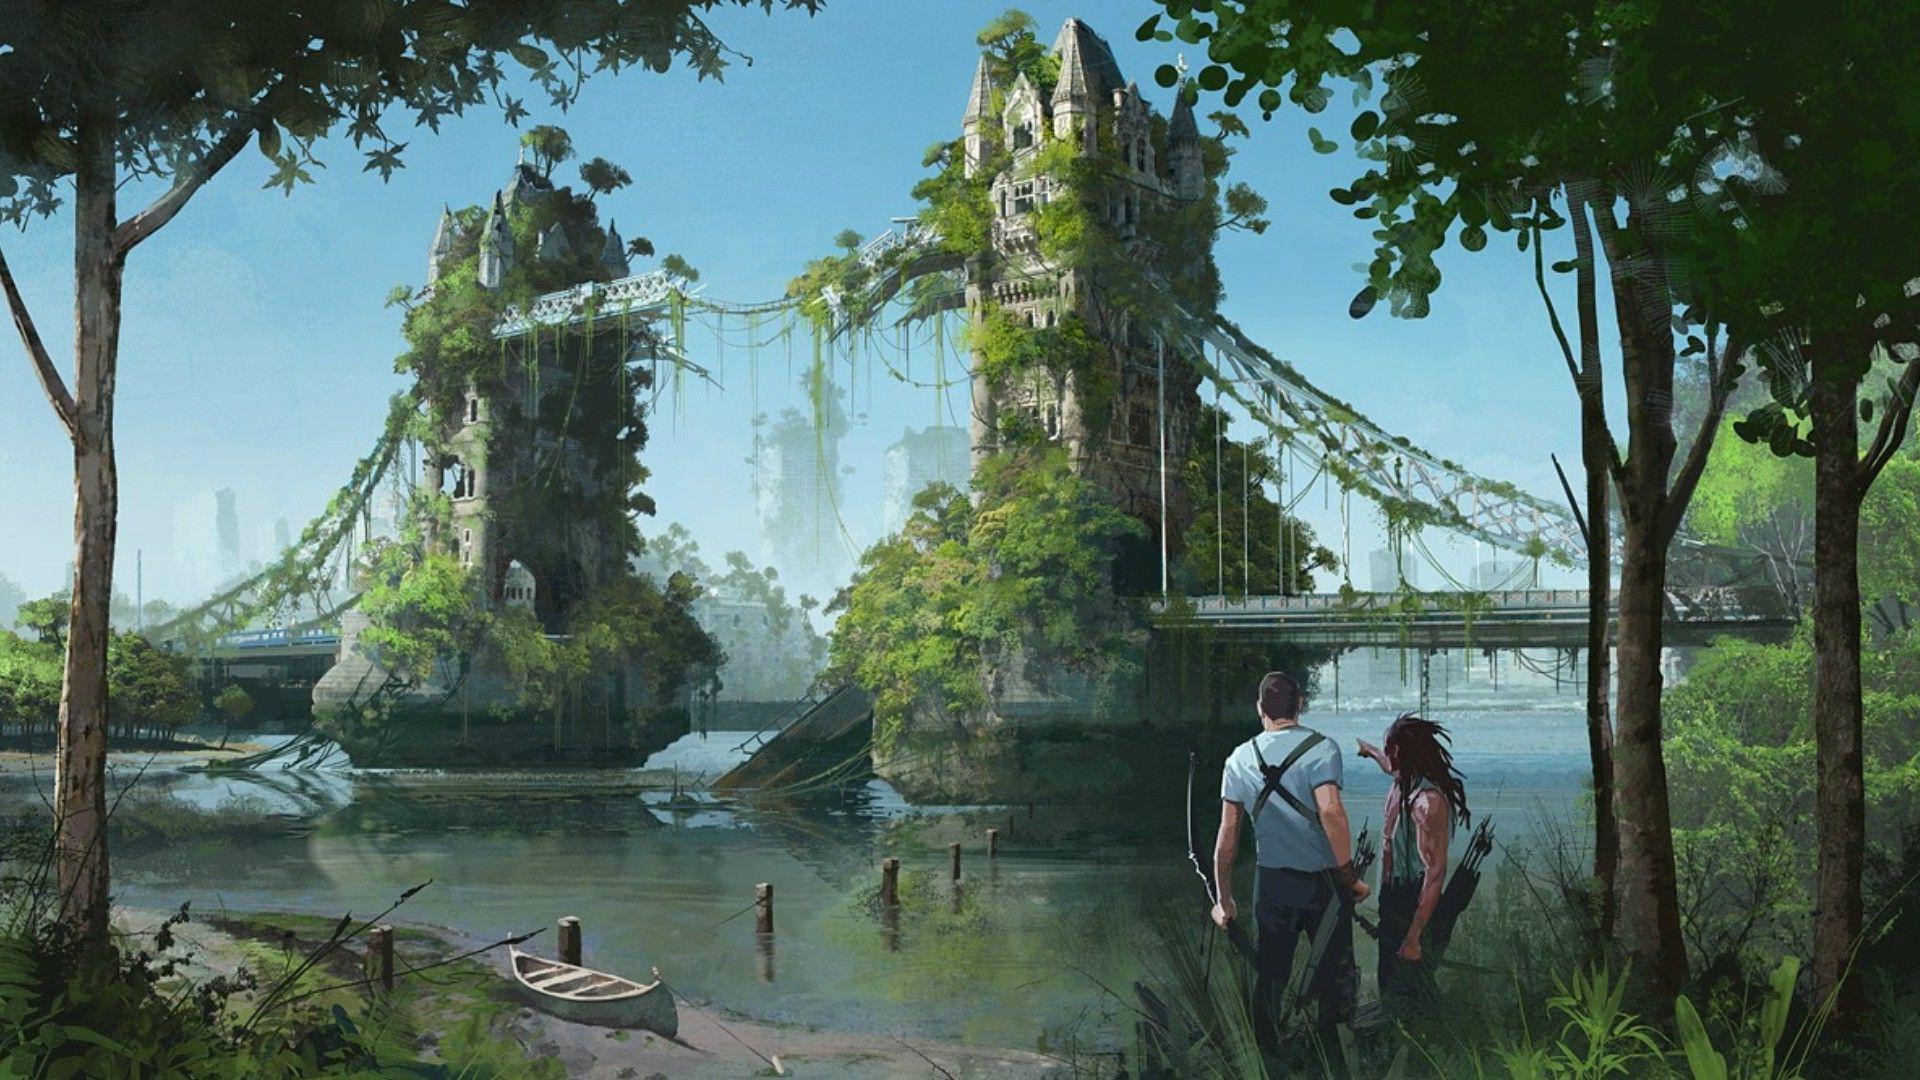 Post apocalyptic hd wallpaper background image - Fantasy wallpaper bridge ...